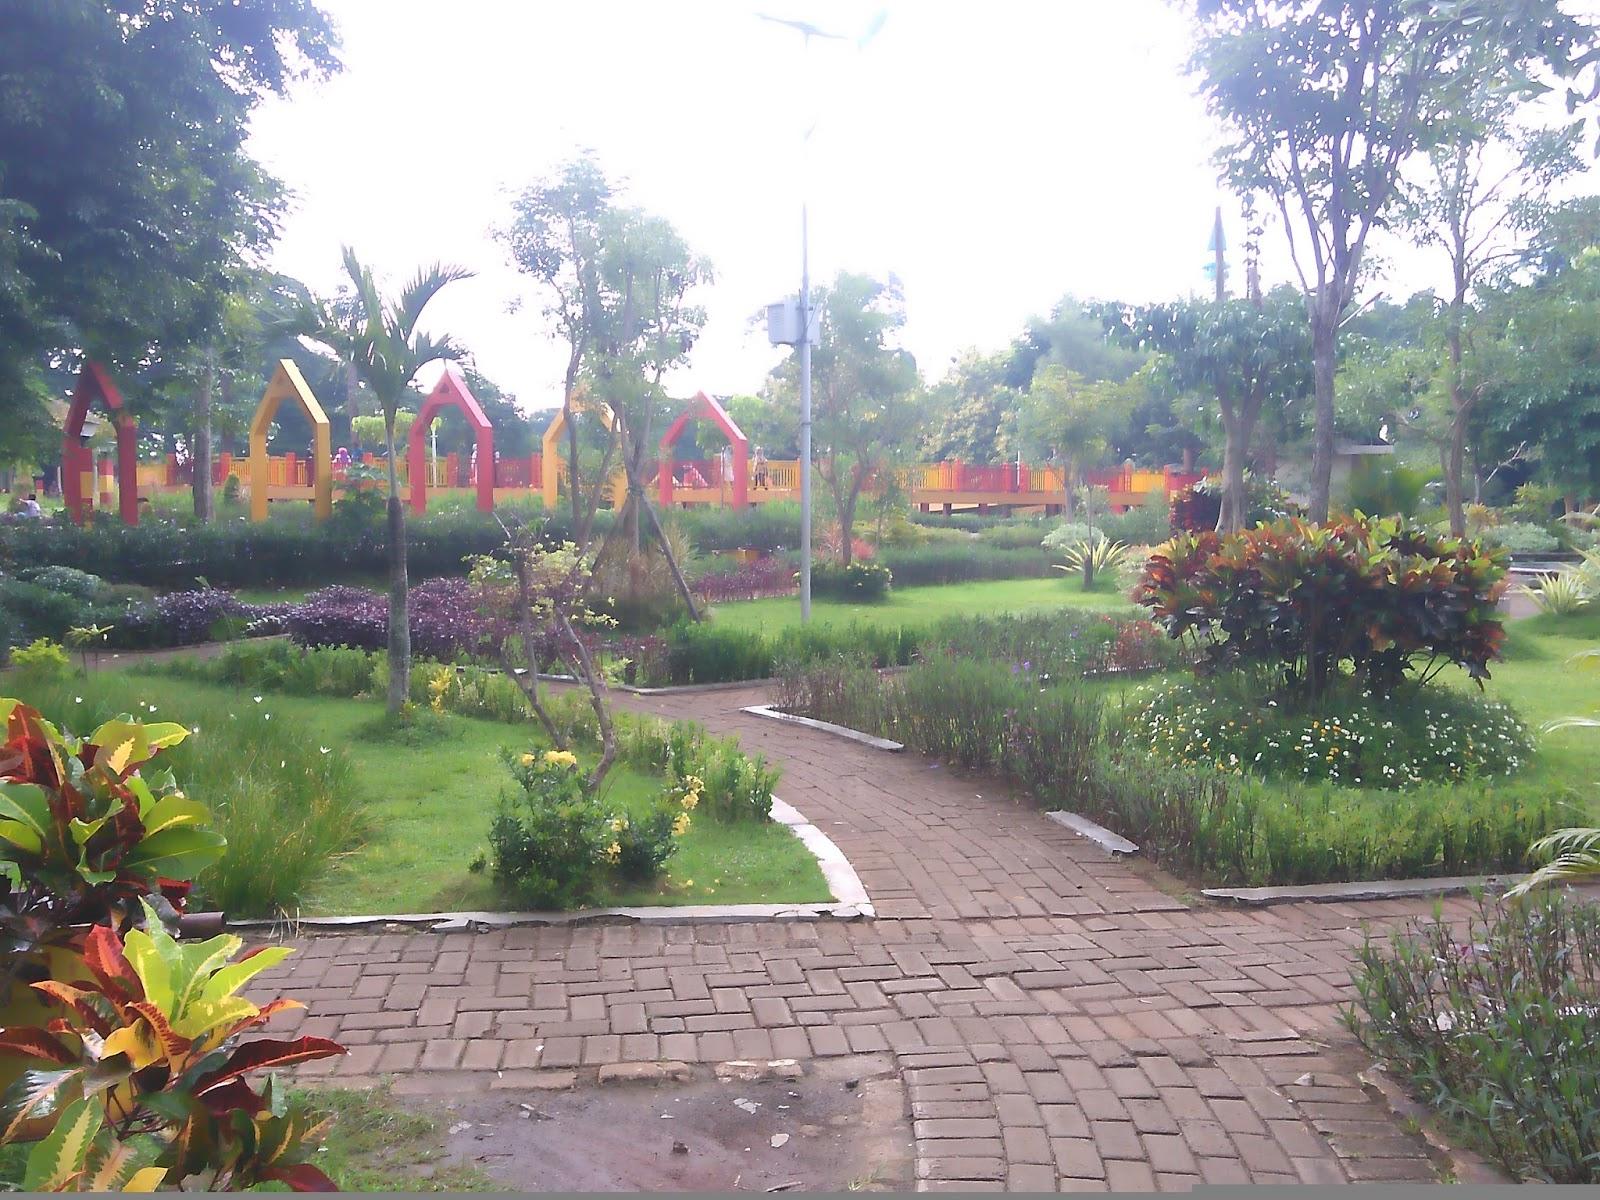 Taman Paseban Pariwisata Terletak Jantung Kota Kabupaten Bangkalan Menjadi Tempat